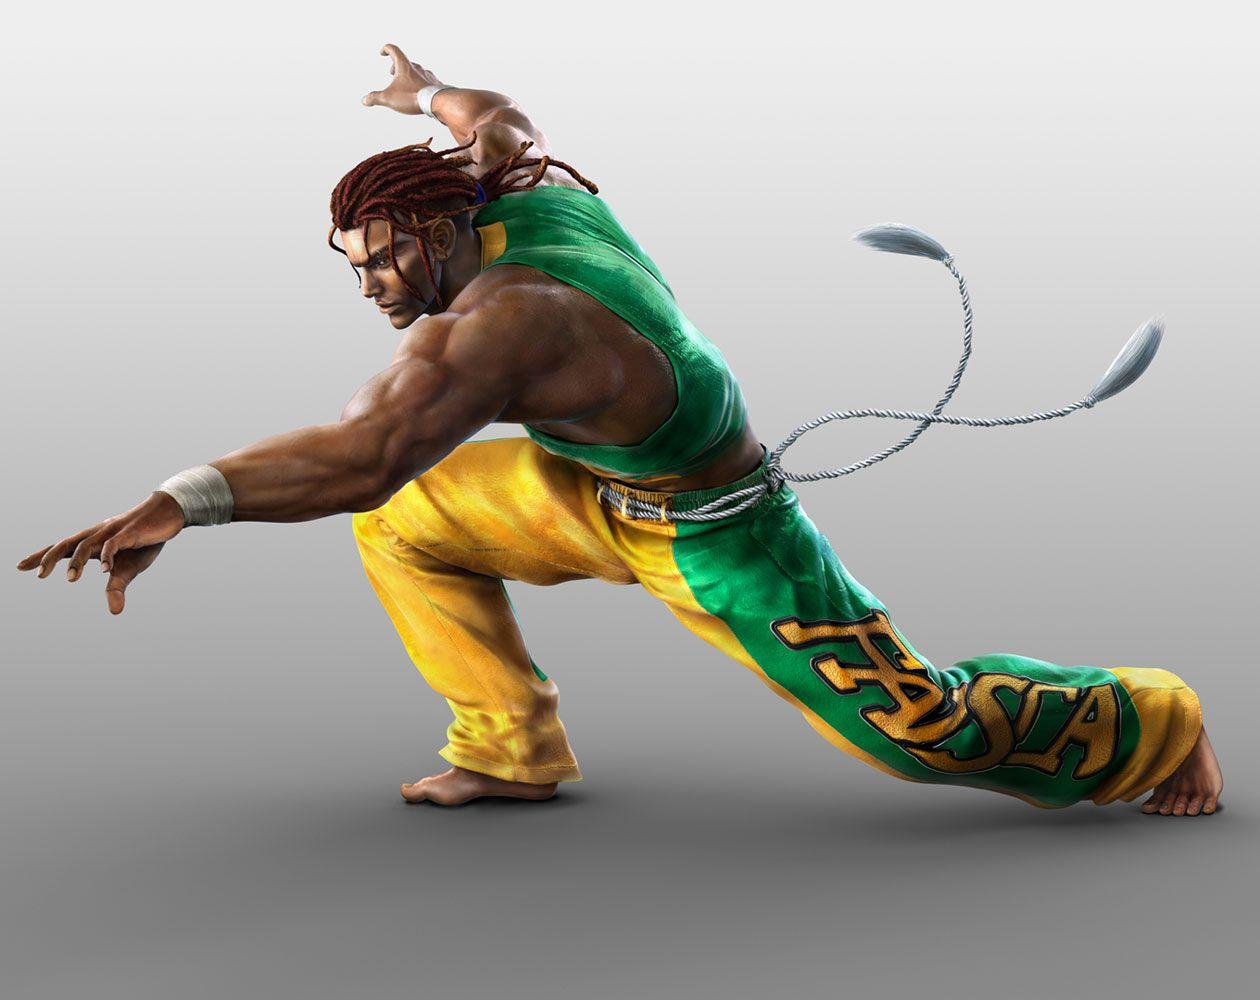 eddy gordo characters art tekken tag tournament 2 capoeira capoeira martial arts gamer pics www pinterest jp